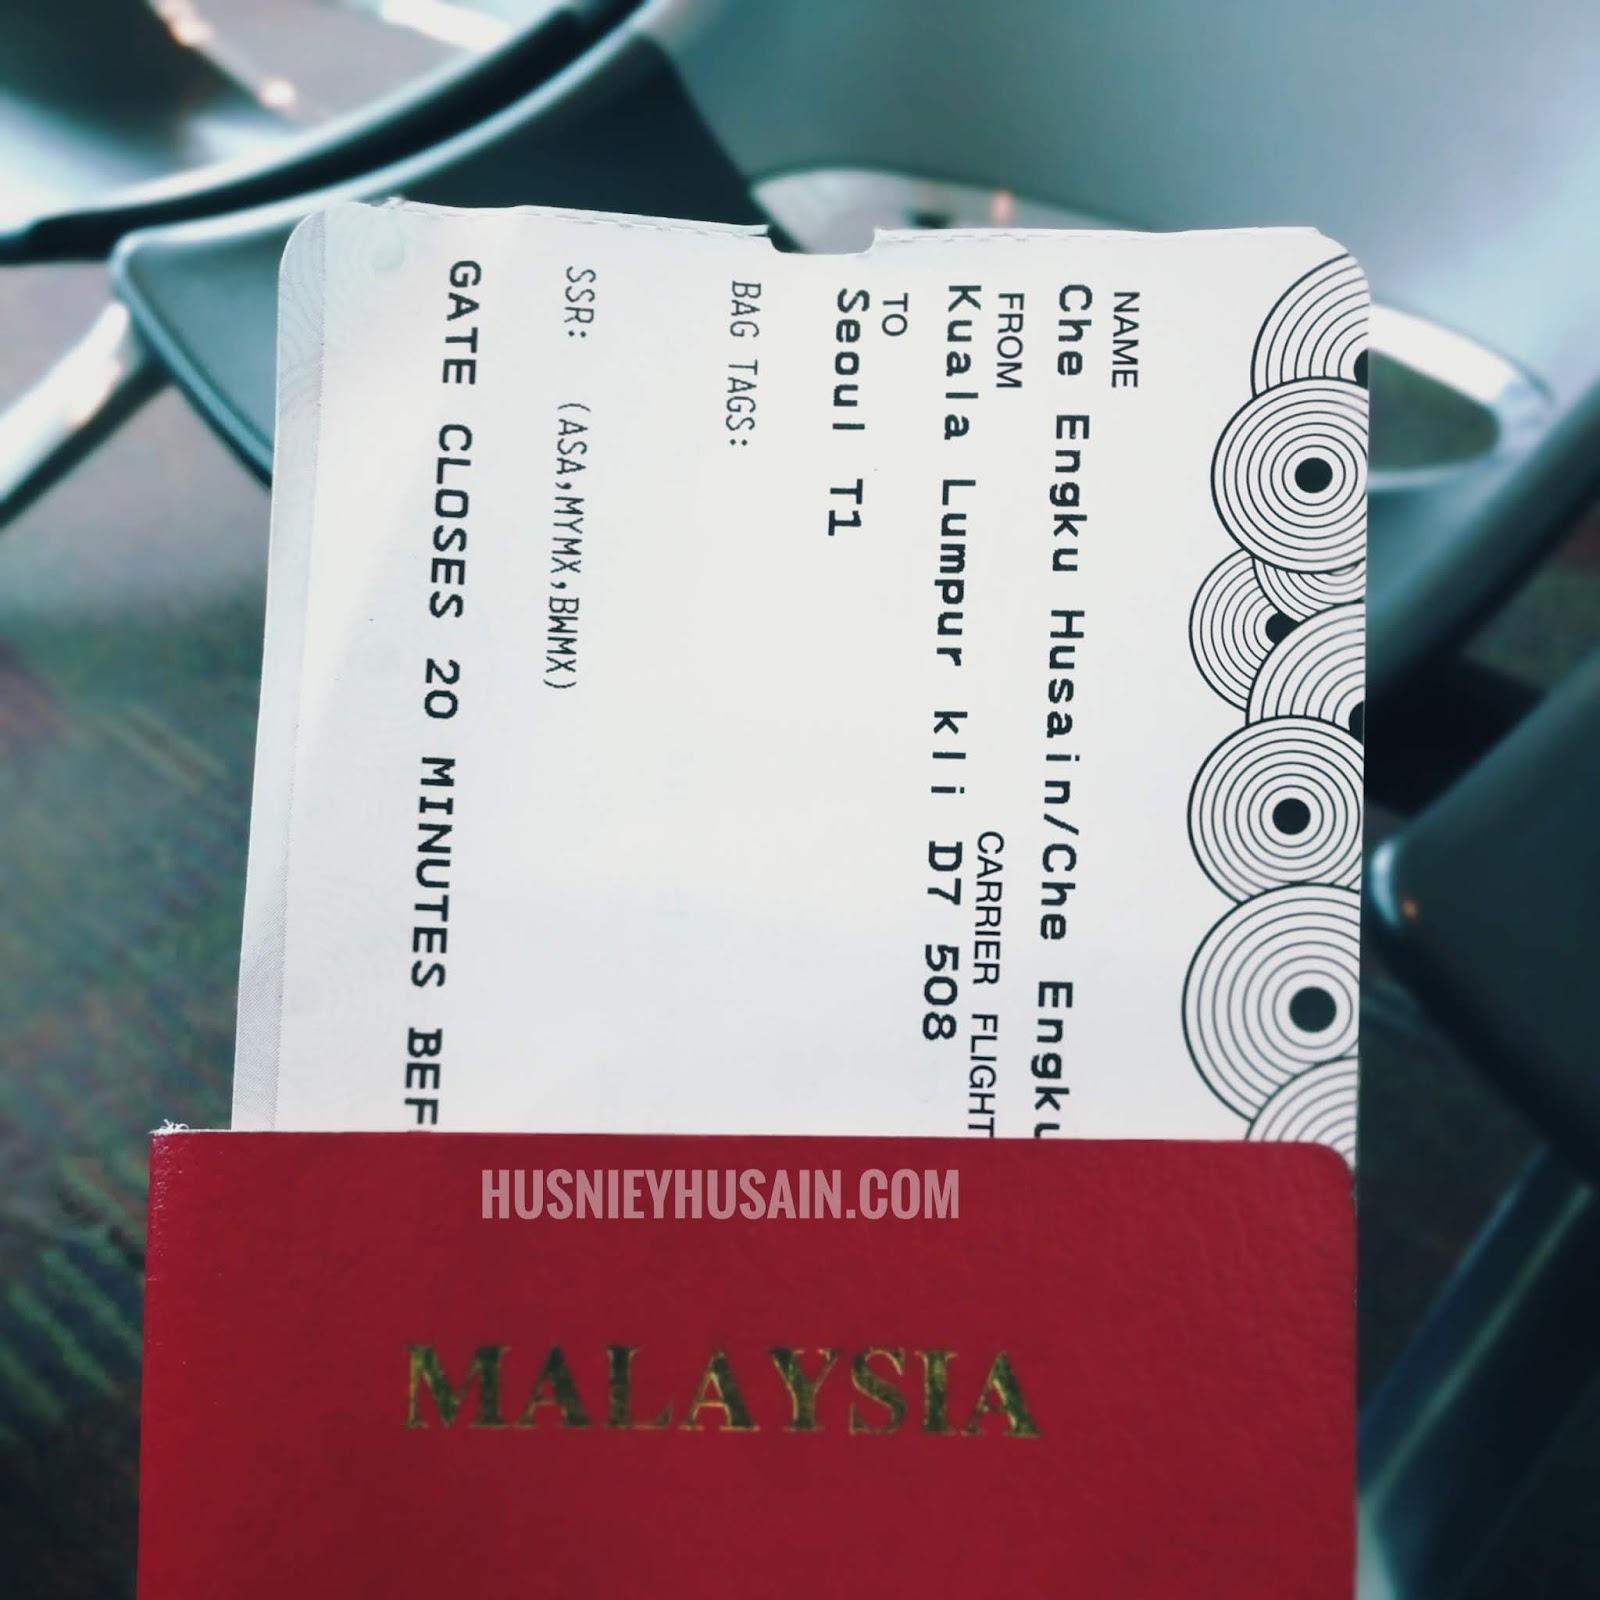 Travel Ke Korea Selatan Berikut Tentang Tiket Penerbangan Pergi Balik Husniey Husain